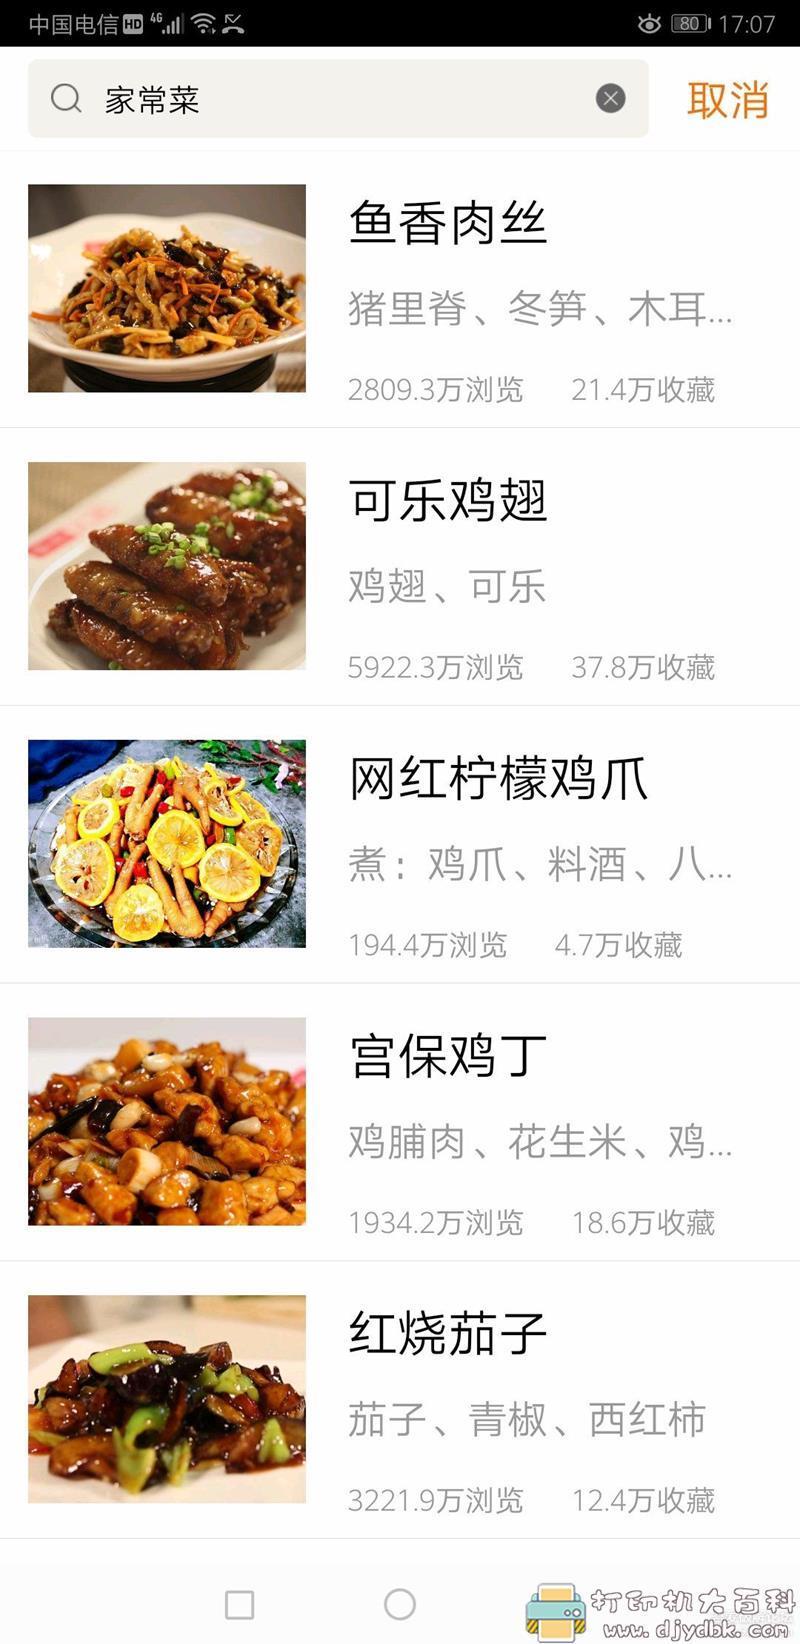 [Android]香哈菜谱6.1.0谷歌市场最新版 配图 No.3